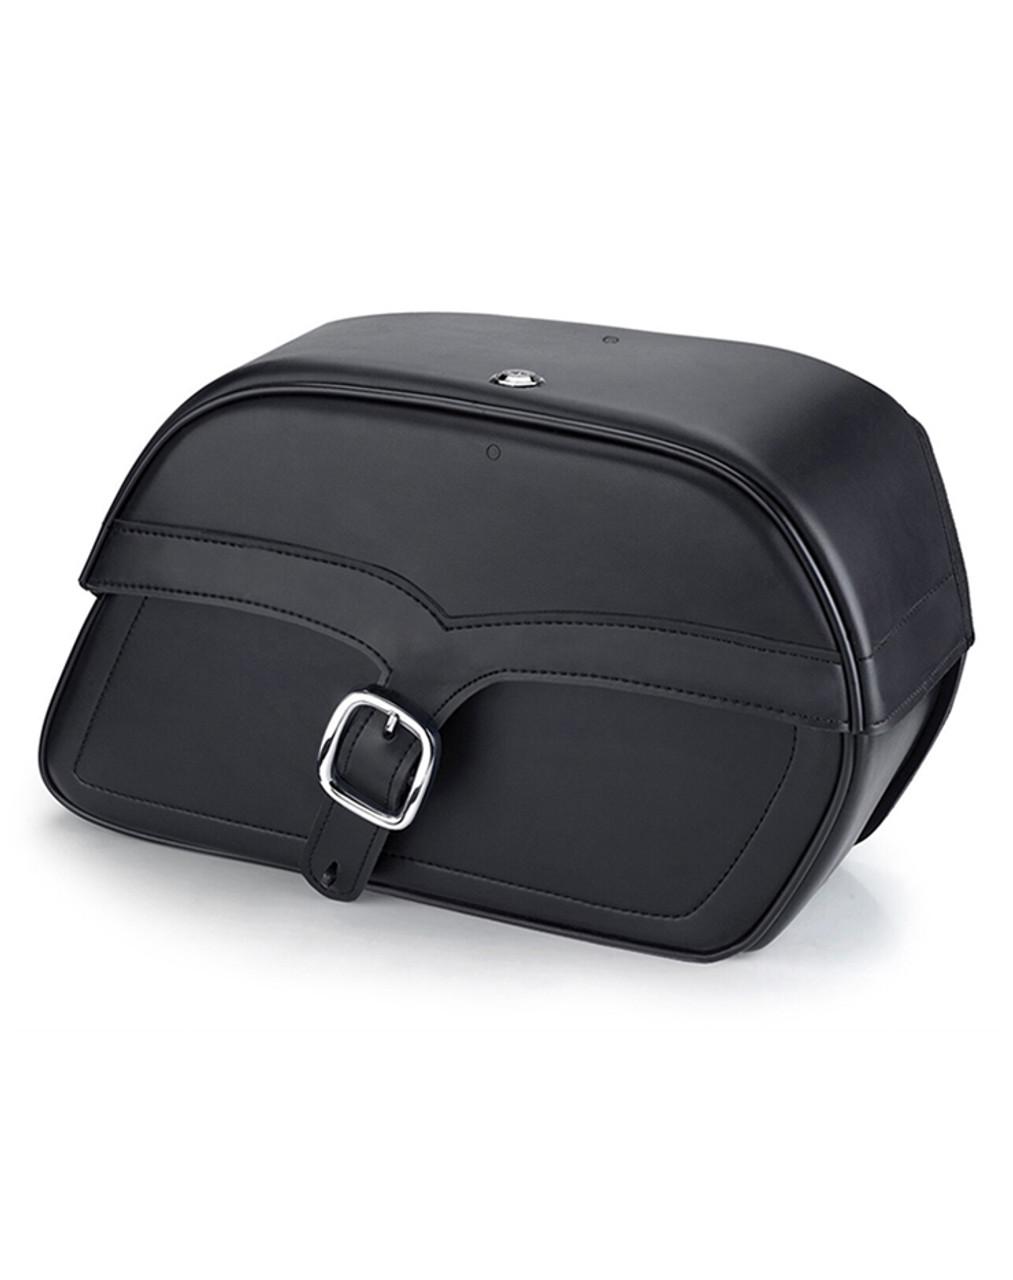 Honda VTX 1800 N Single Strap Shock Cutout Slanted Large Motorcycle Saddlebags Main Bag View